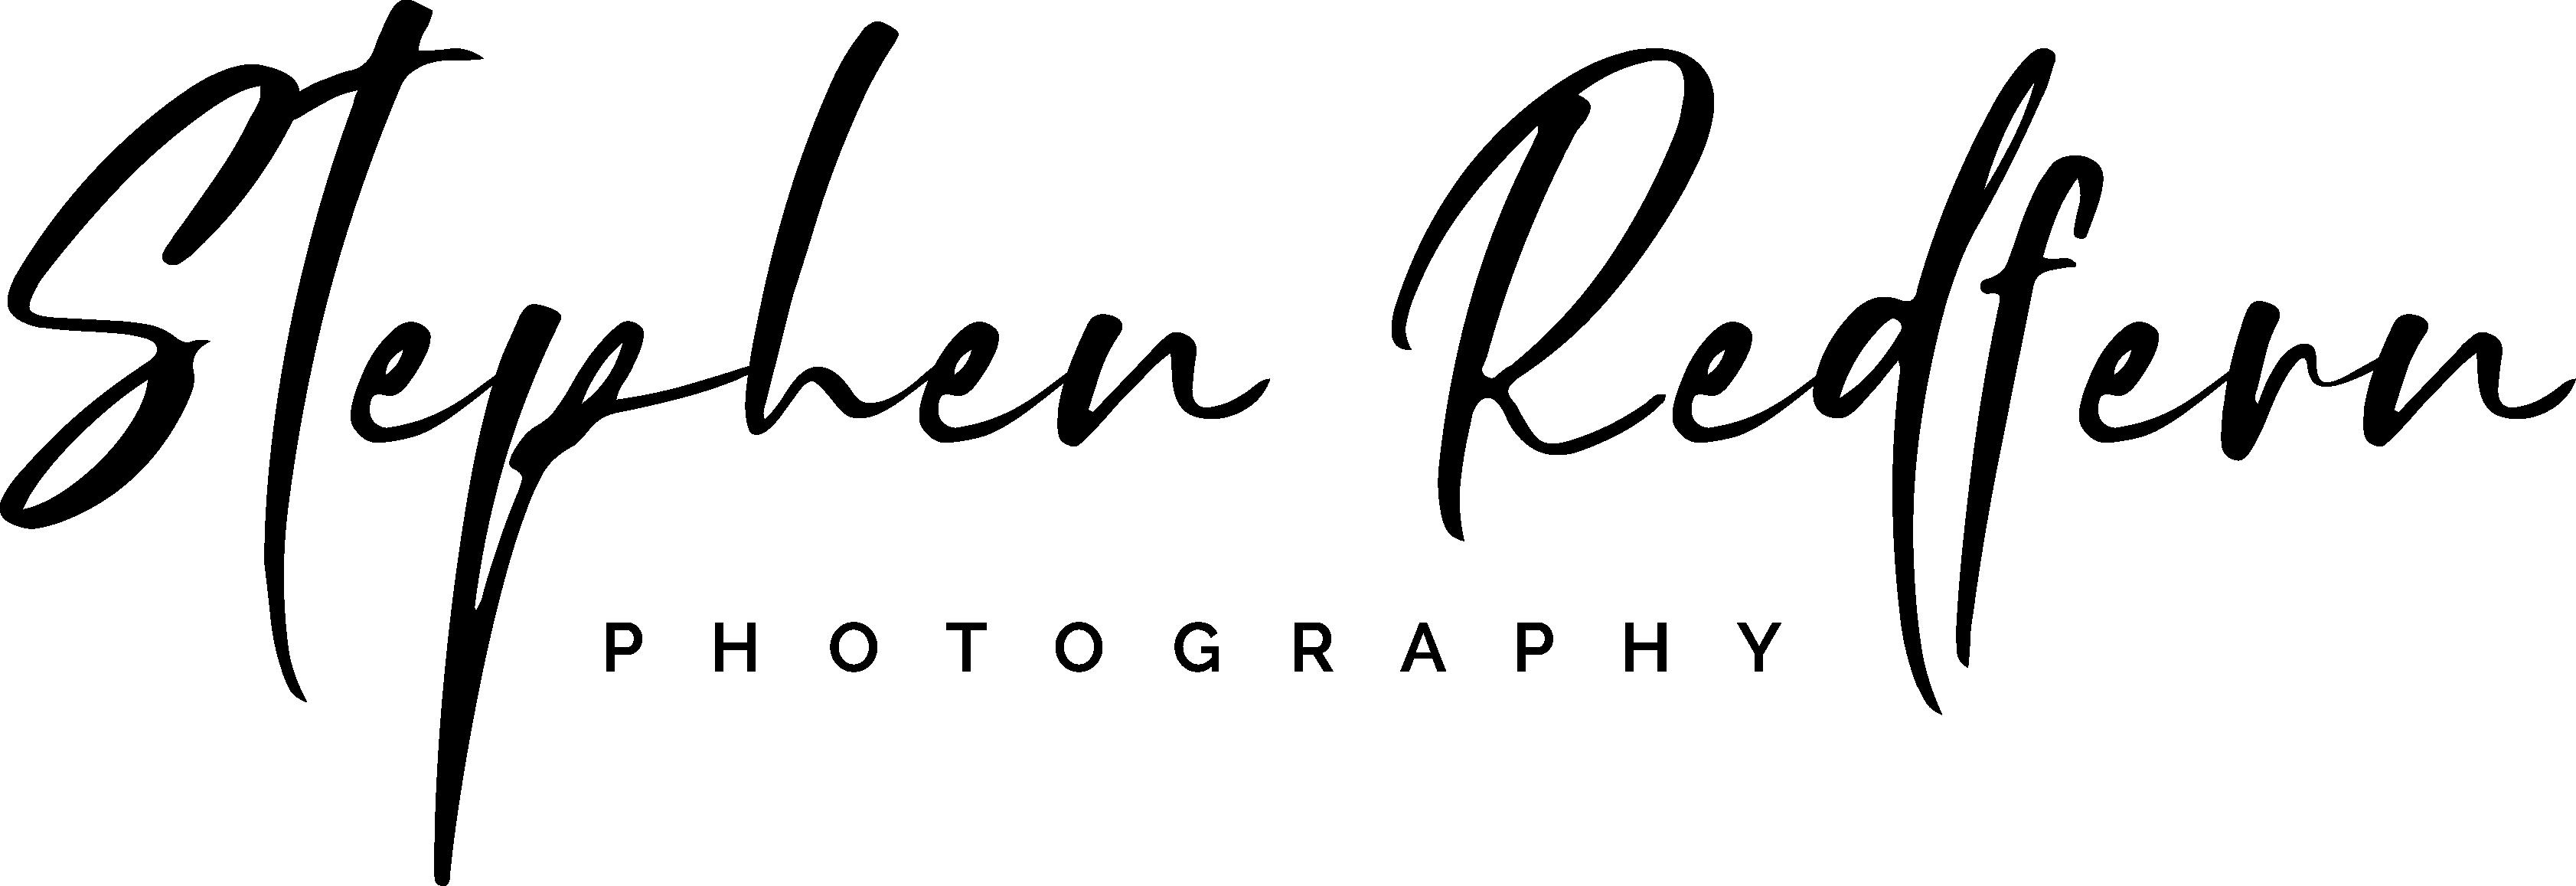 stephen redfern photography